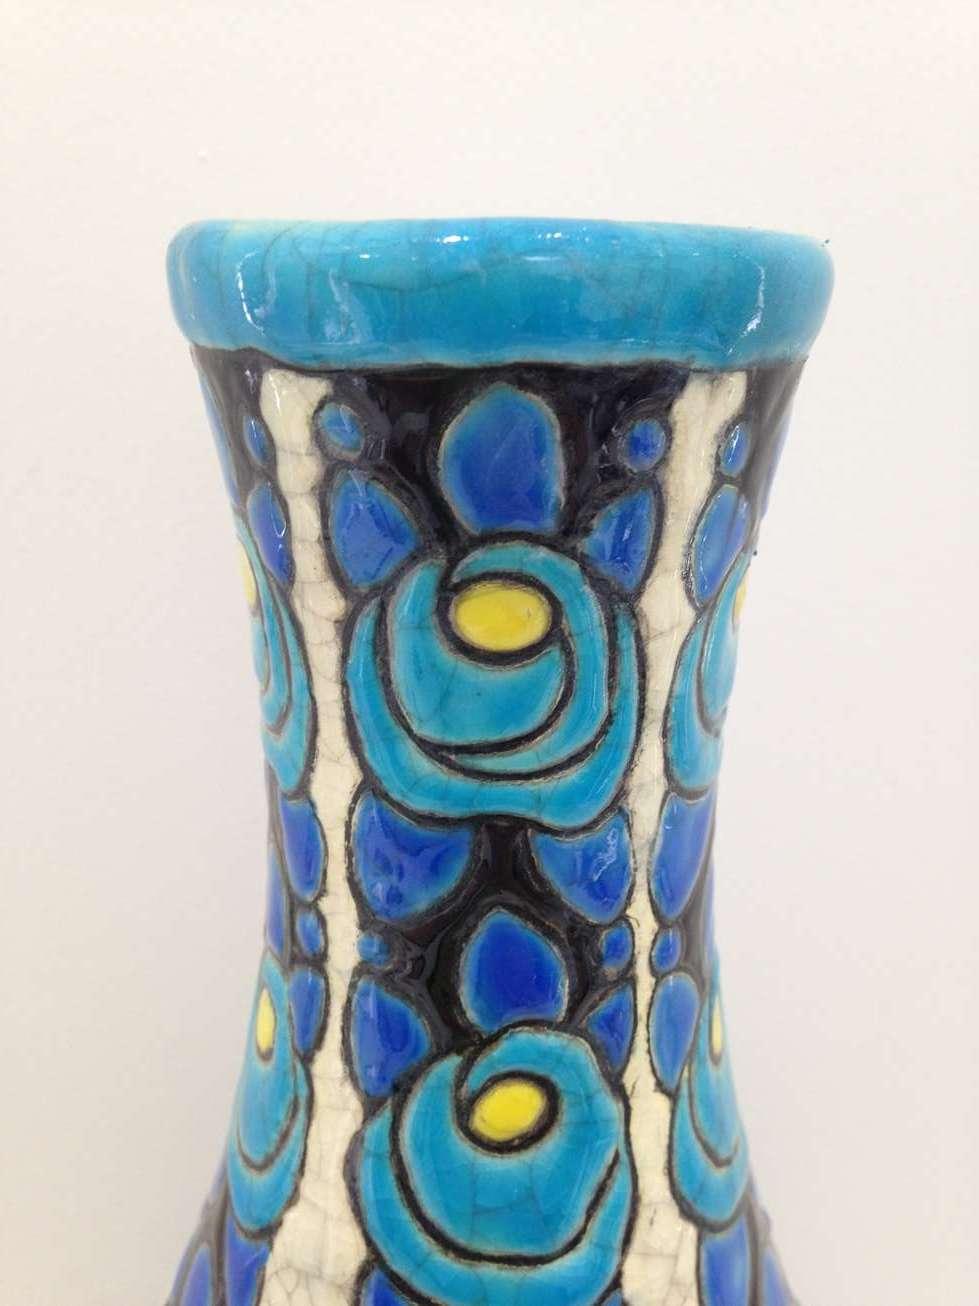 longwy-emaux-faience-bleu-turquoise-transparence-restauration-illusuiniste-invisible-restaurarte-art-ancien.jpg